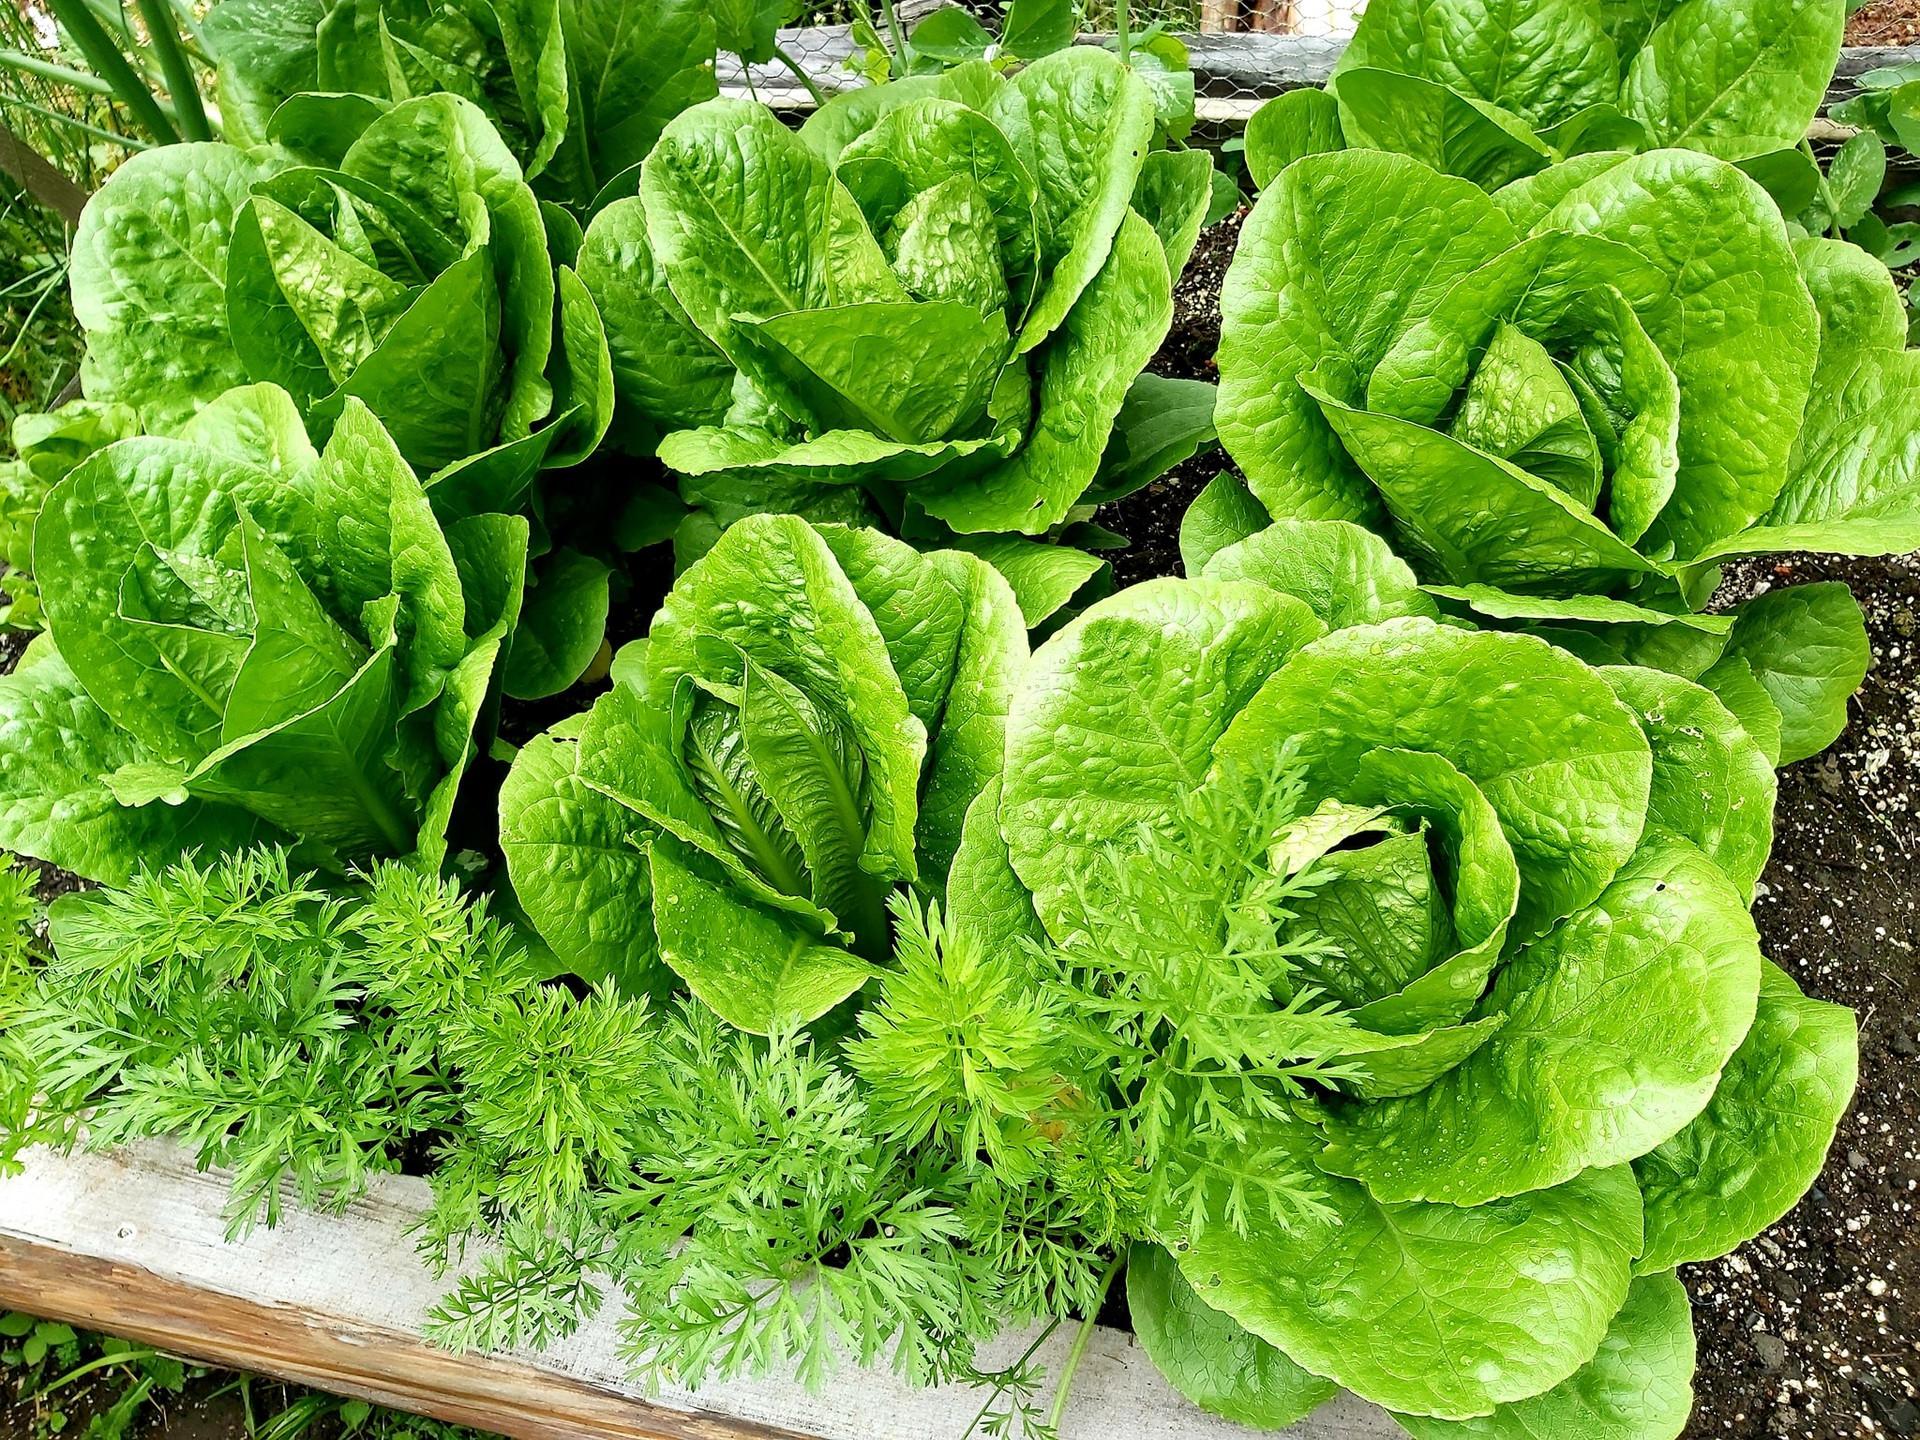 lettucecrop.jpg